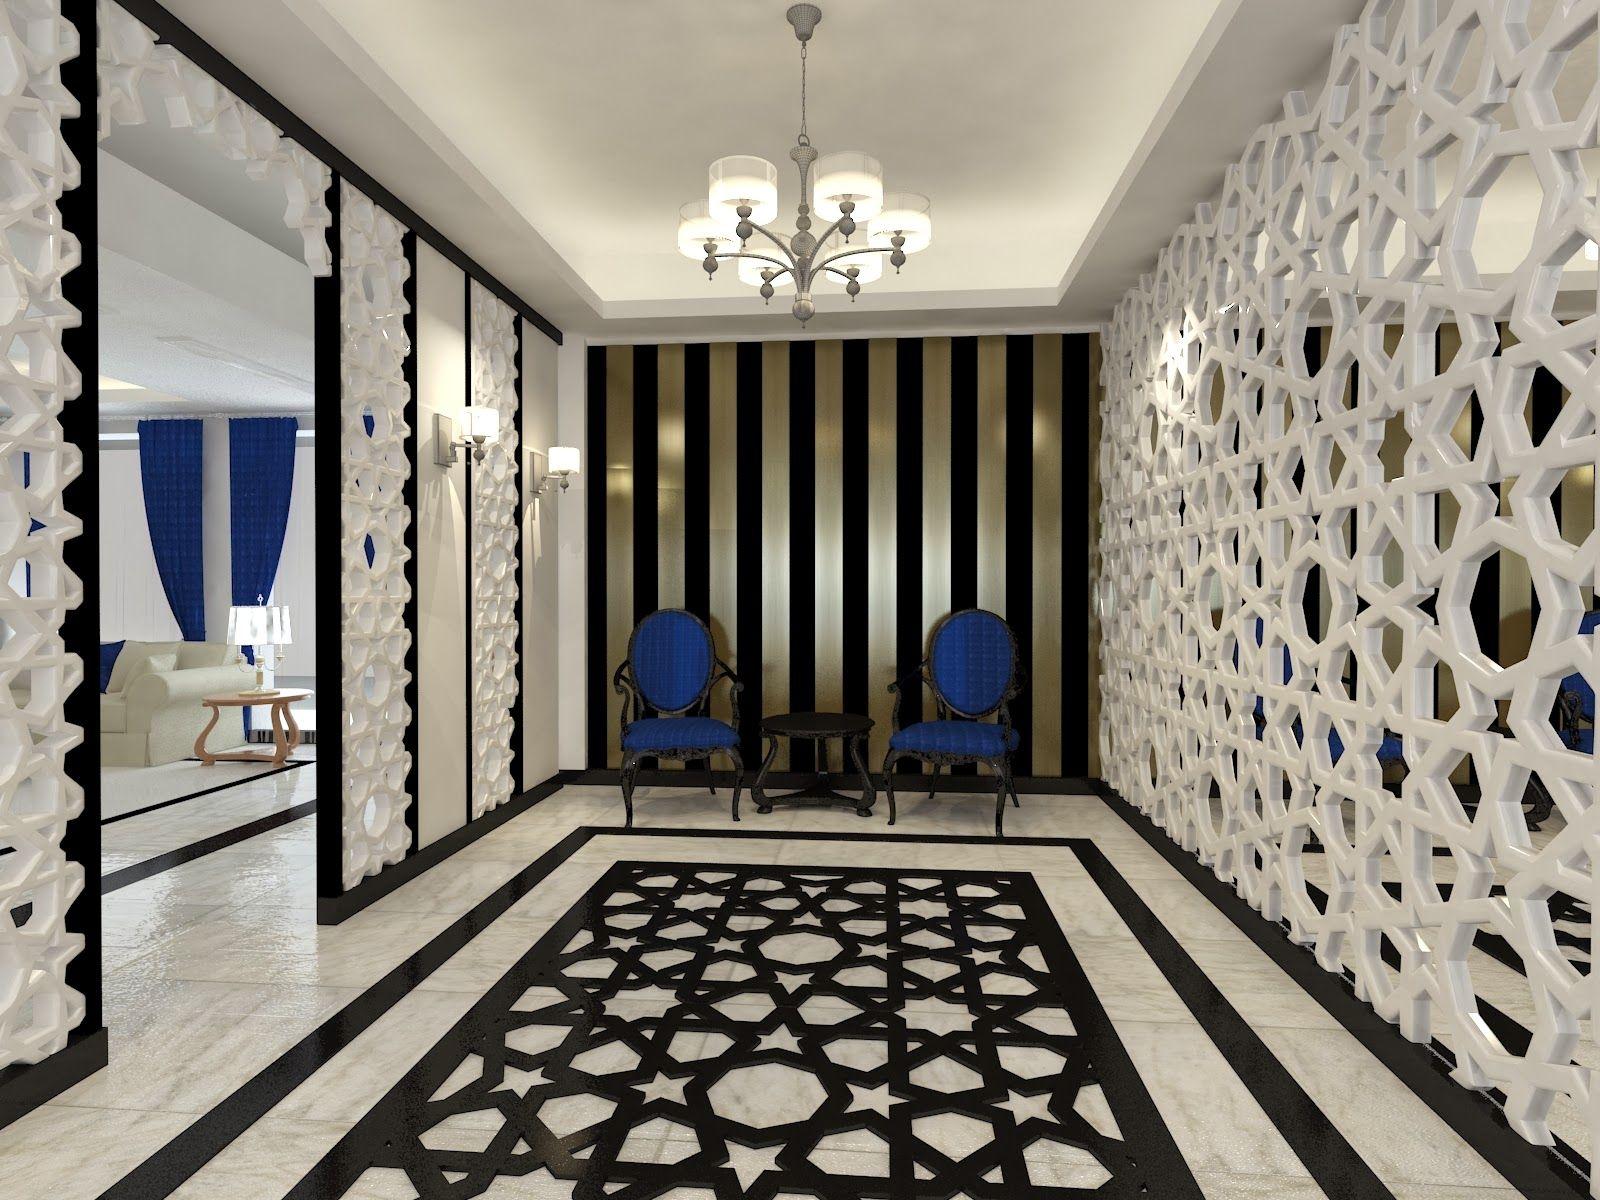 Arredamento Indonesiano ~ Inspirations modern islamic interior and modern islamic interior